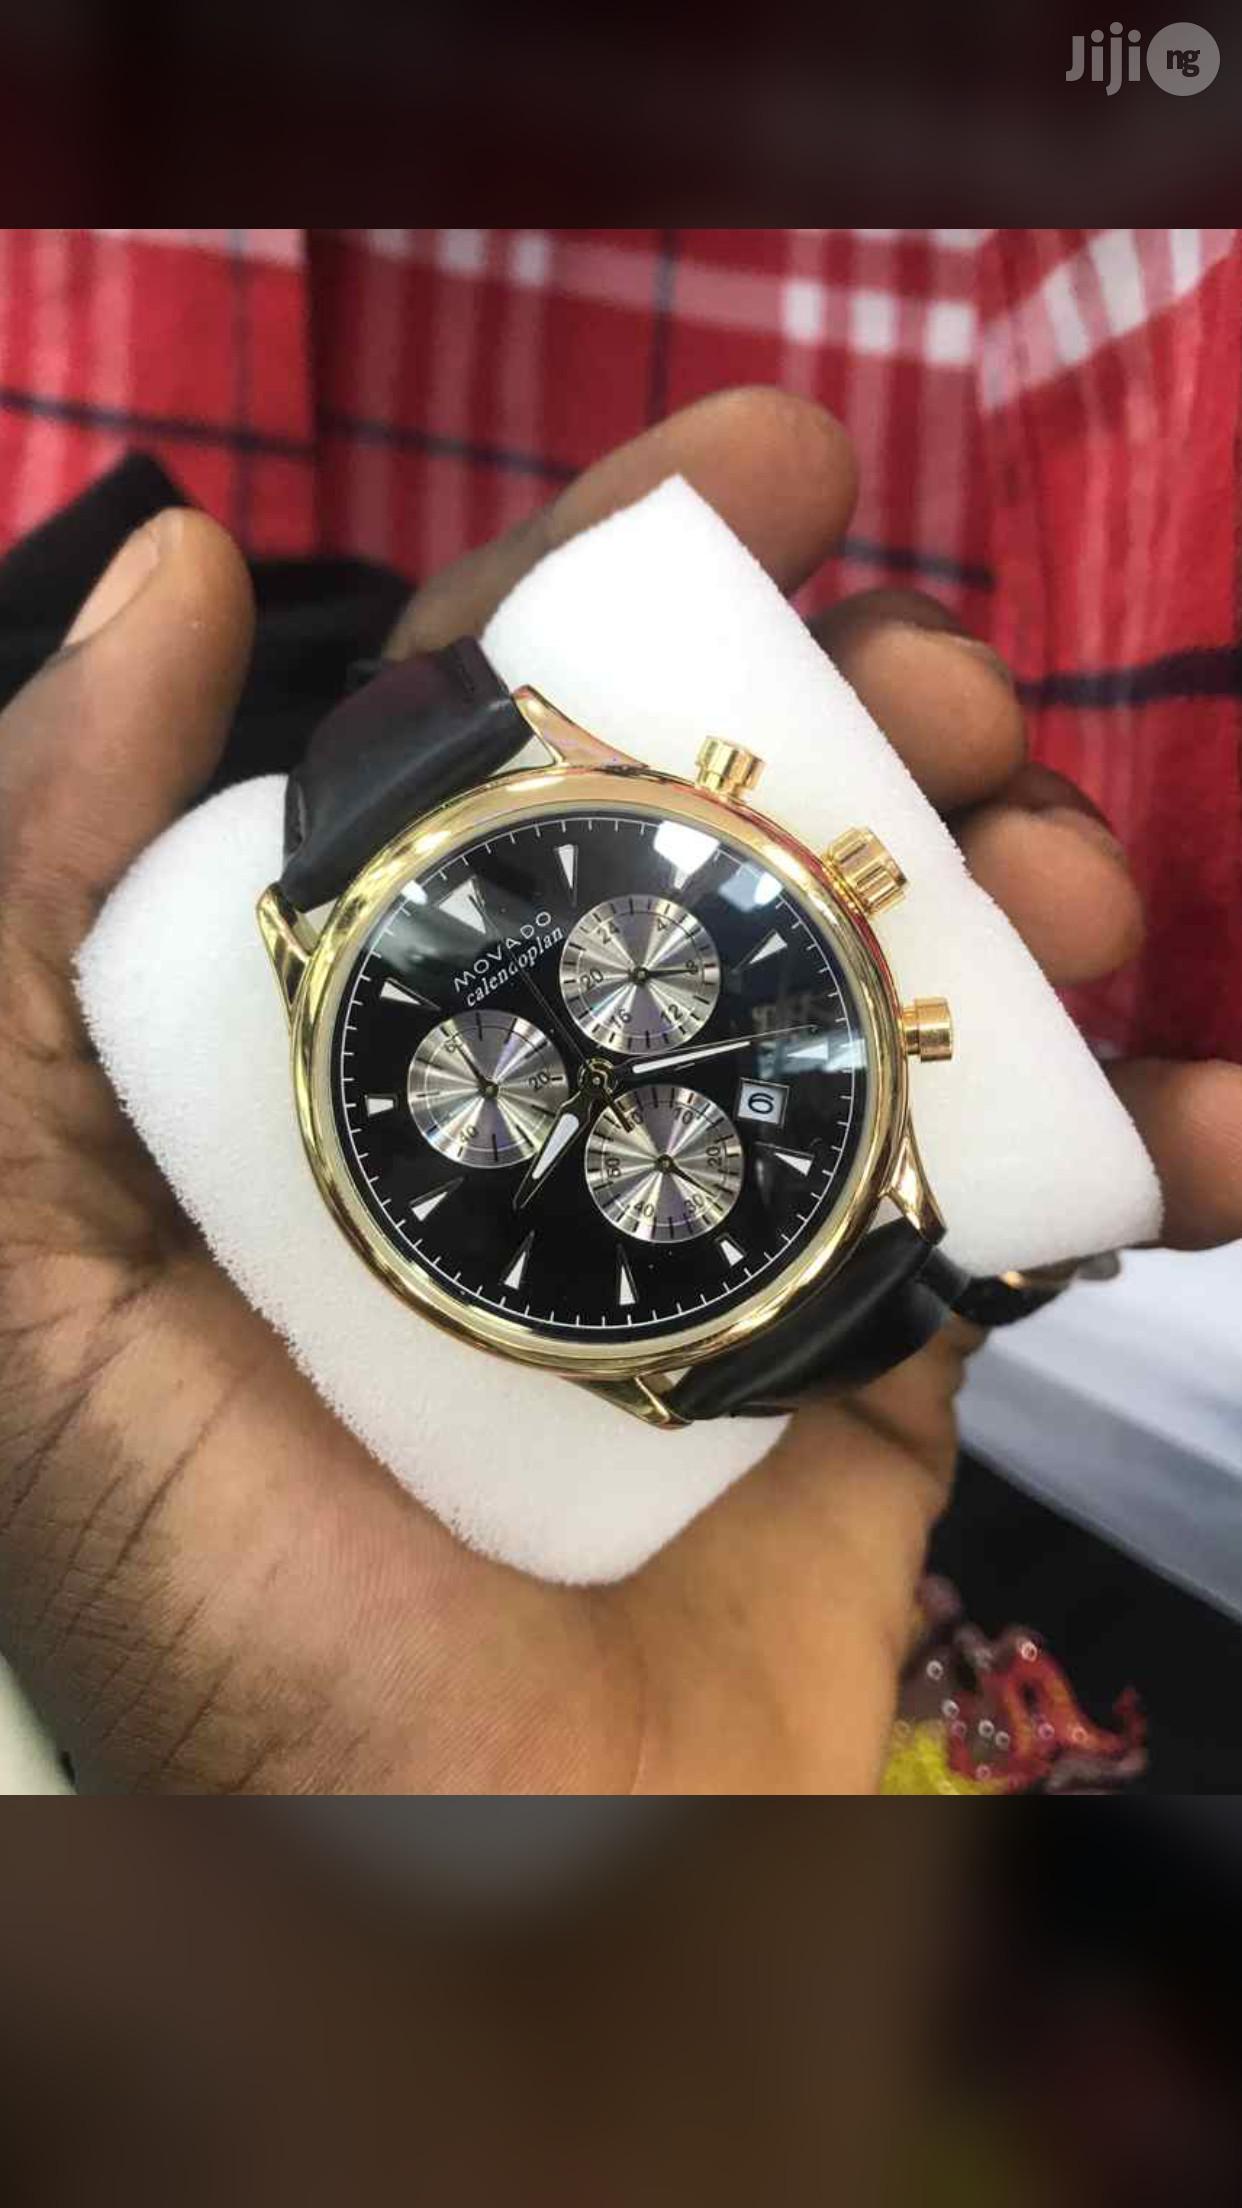 Movado Chronograph Genuine Leather Strap Watch